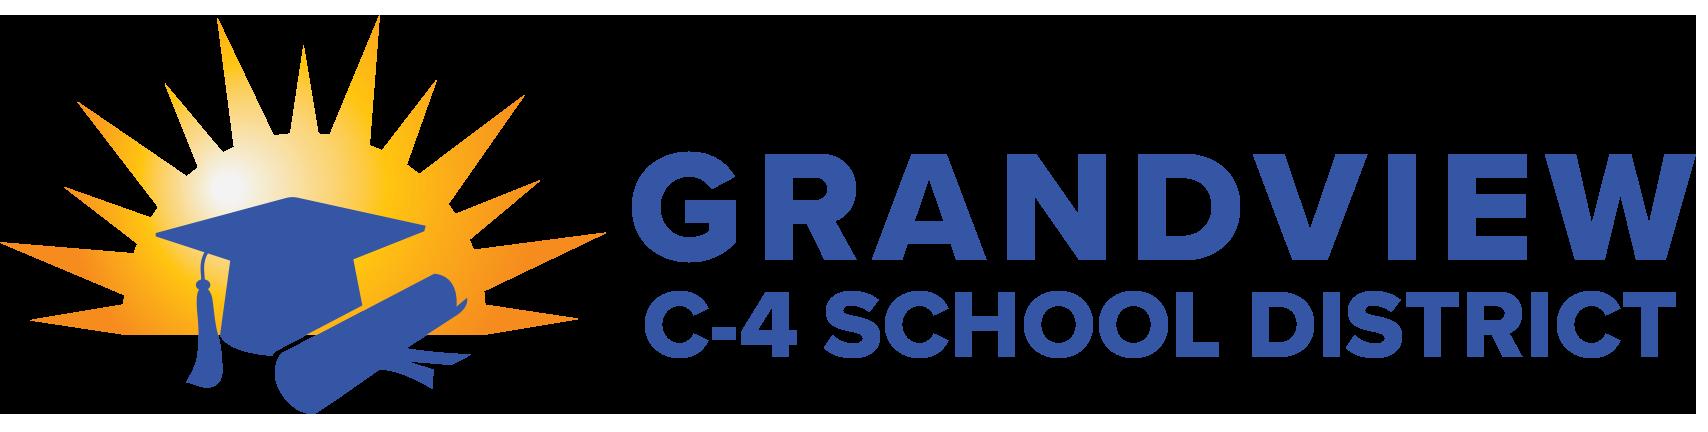 Grandview C-4 School District